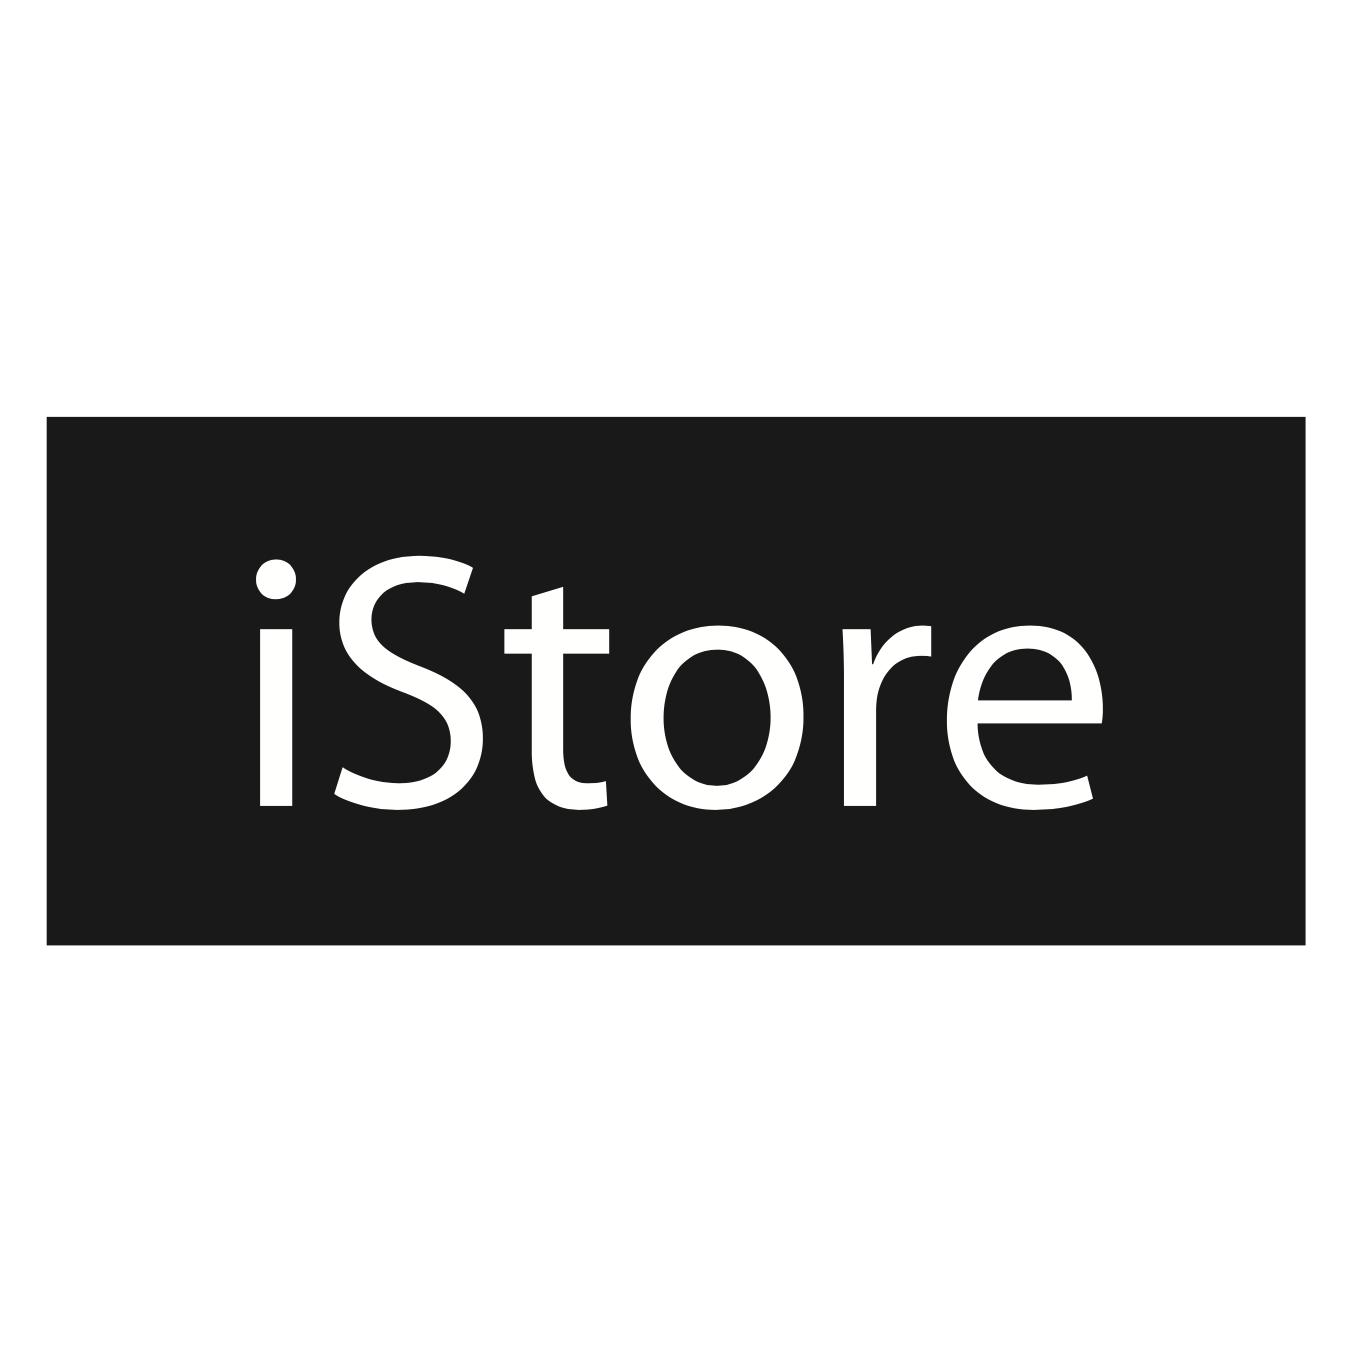 12-inch MacBook 1.2 GHZ Core m5 512GB - Space Grey